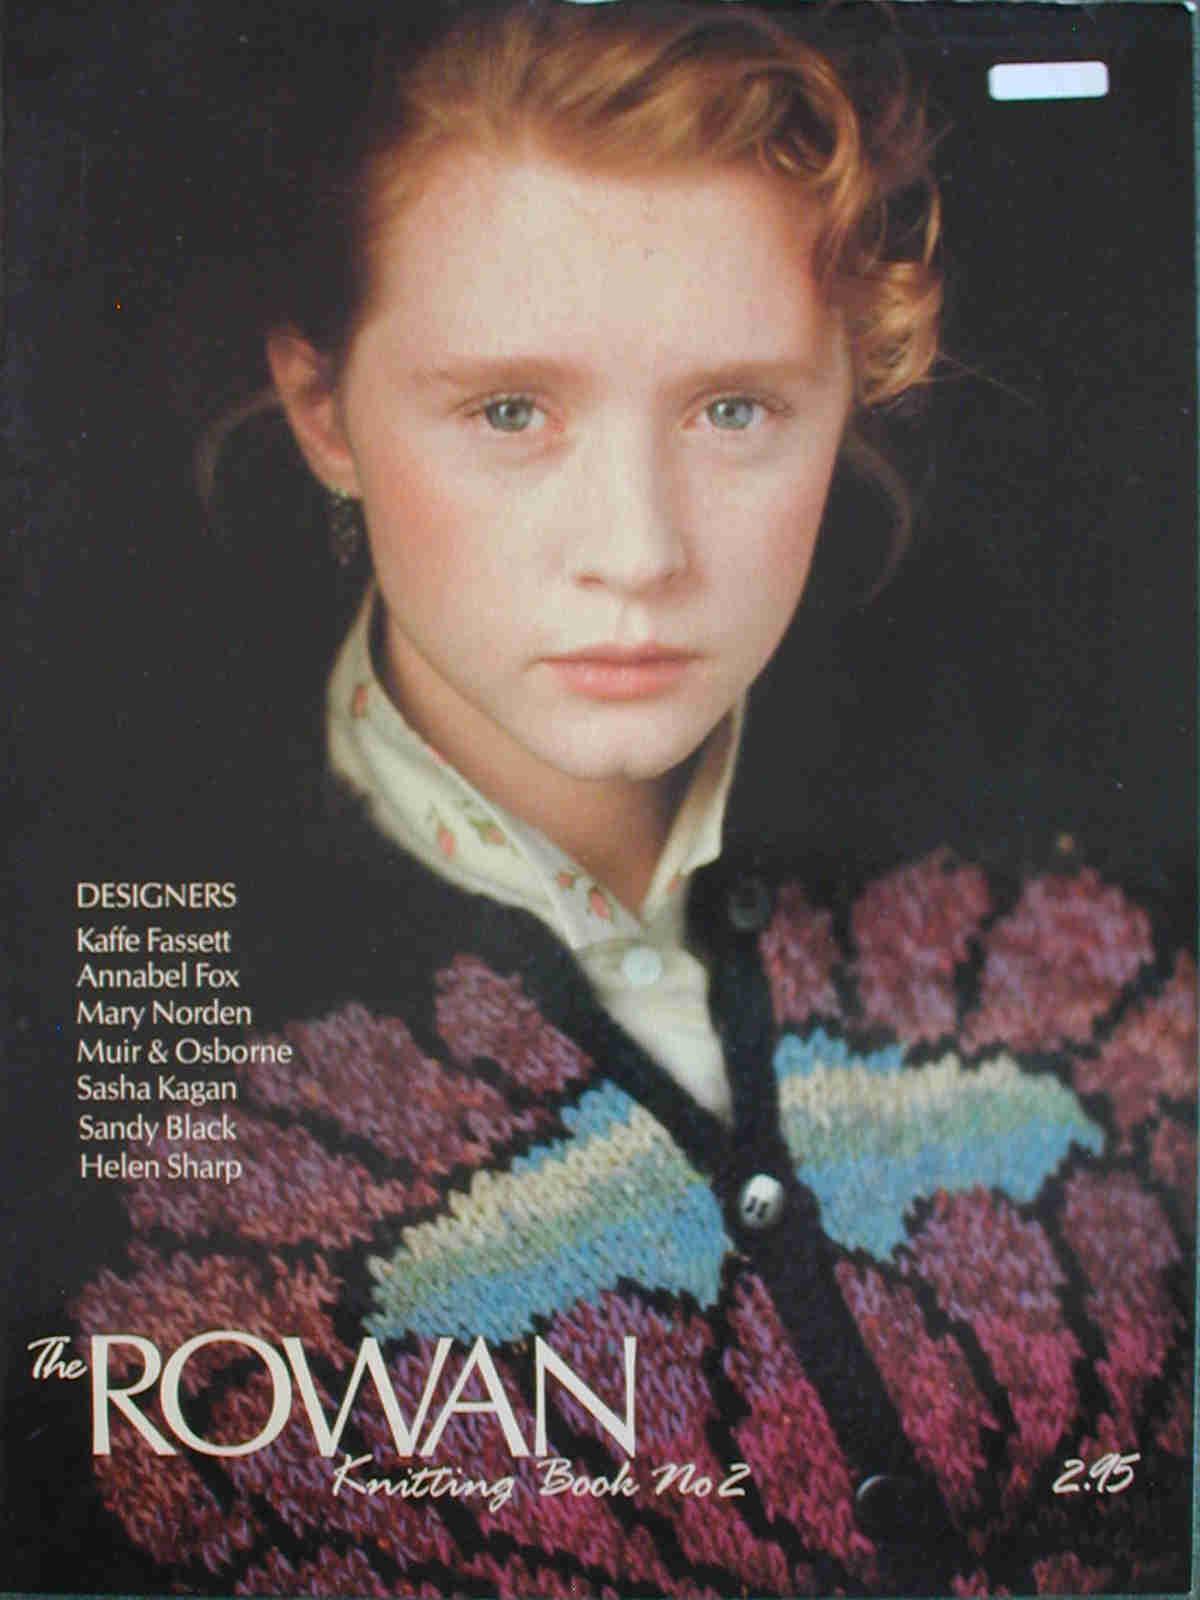 Rowan Knitting Books : Used knitting books just